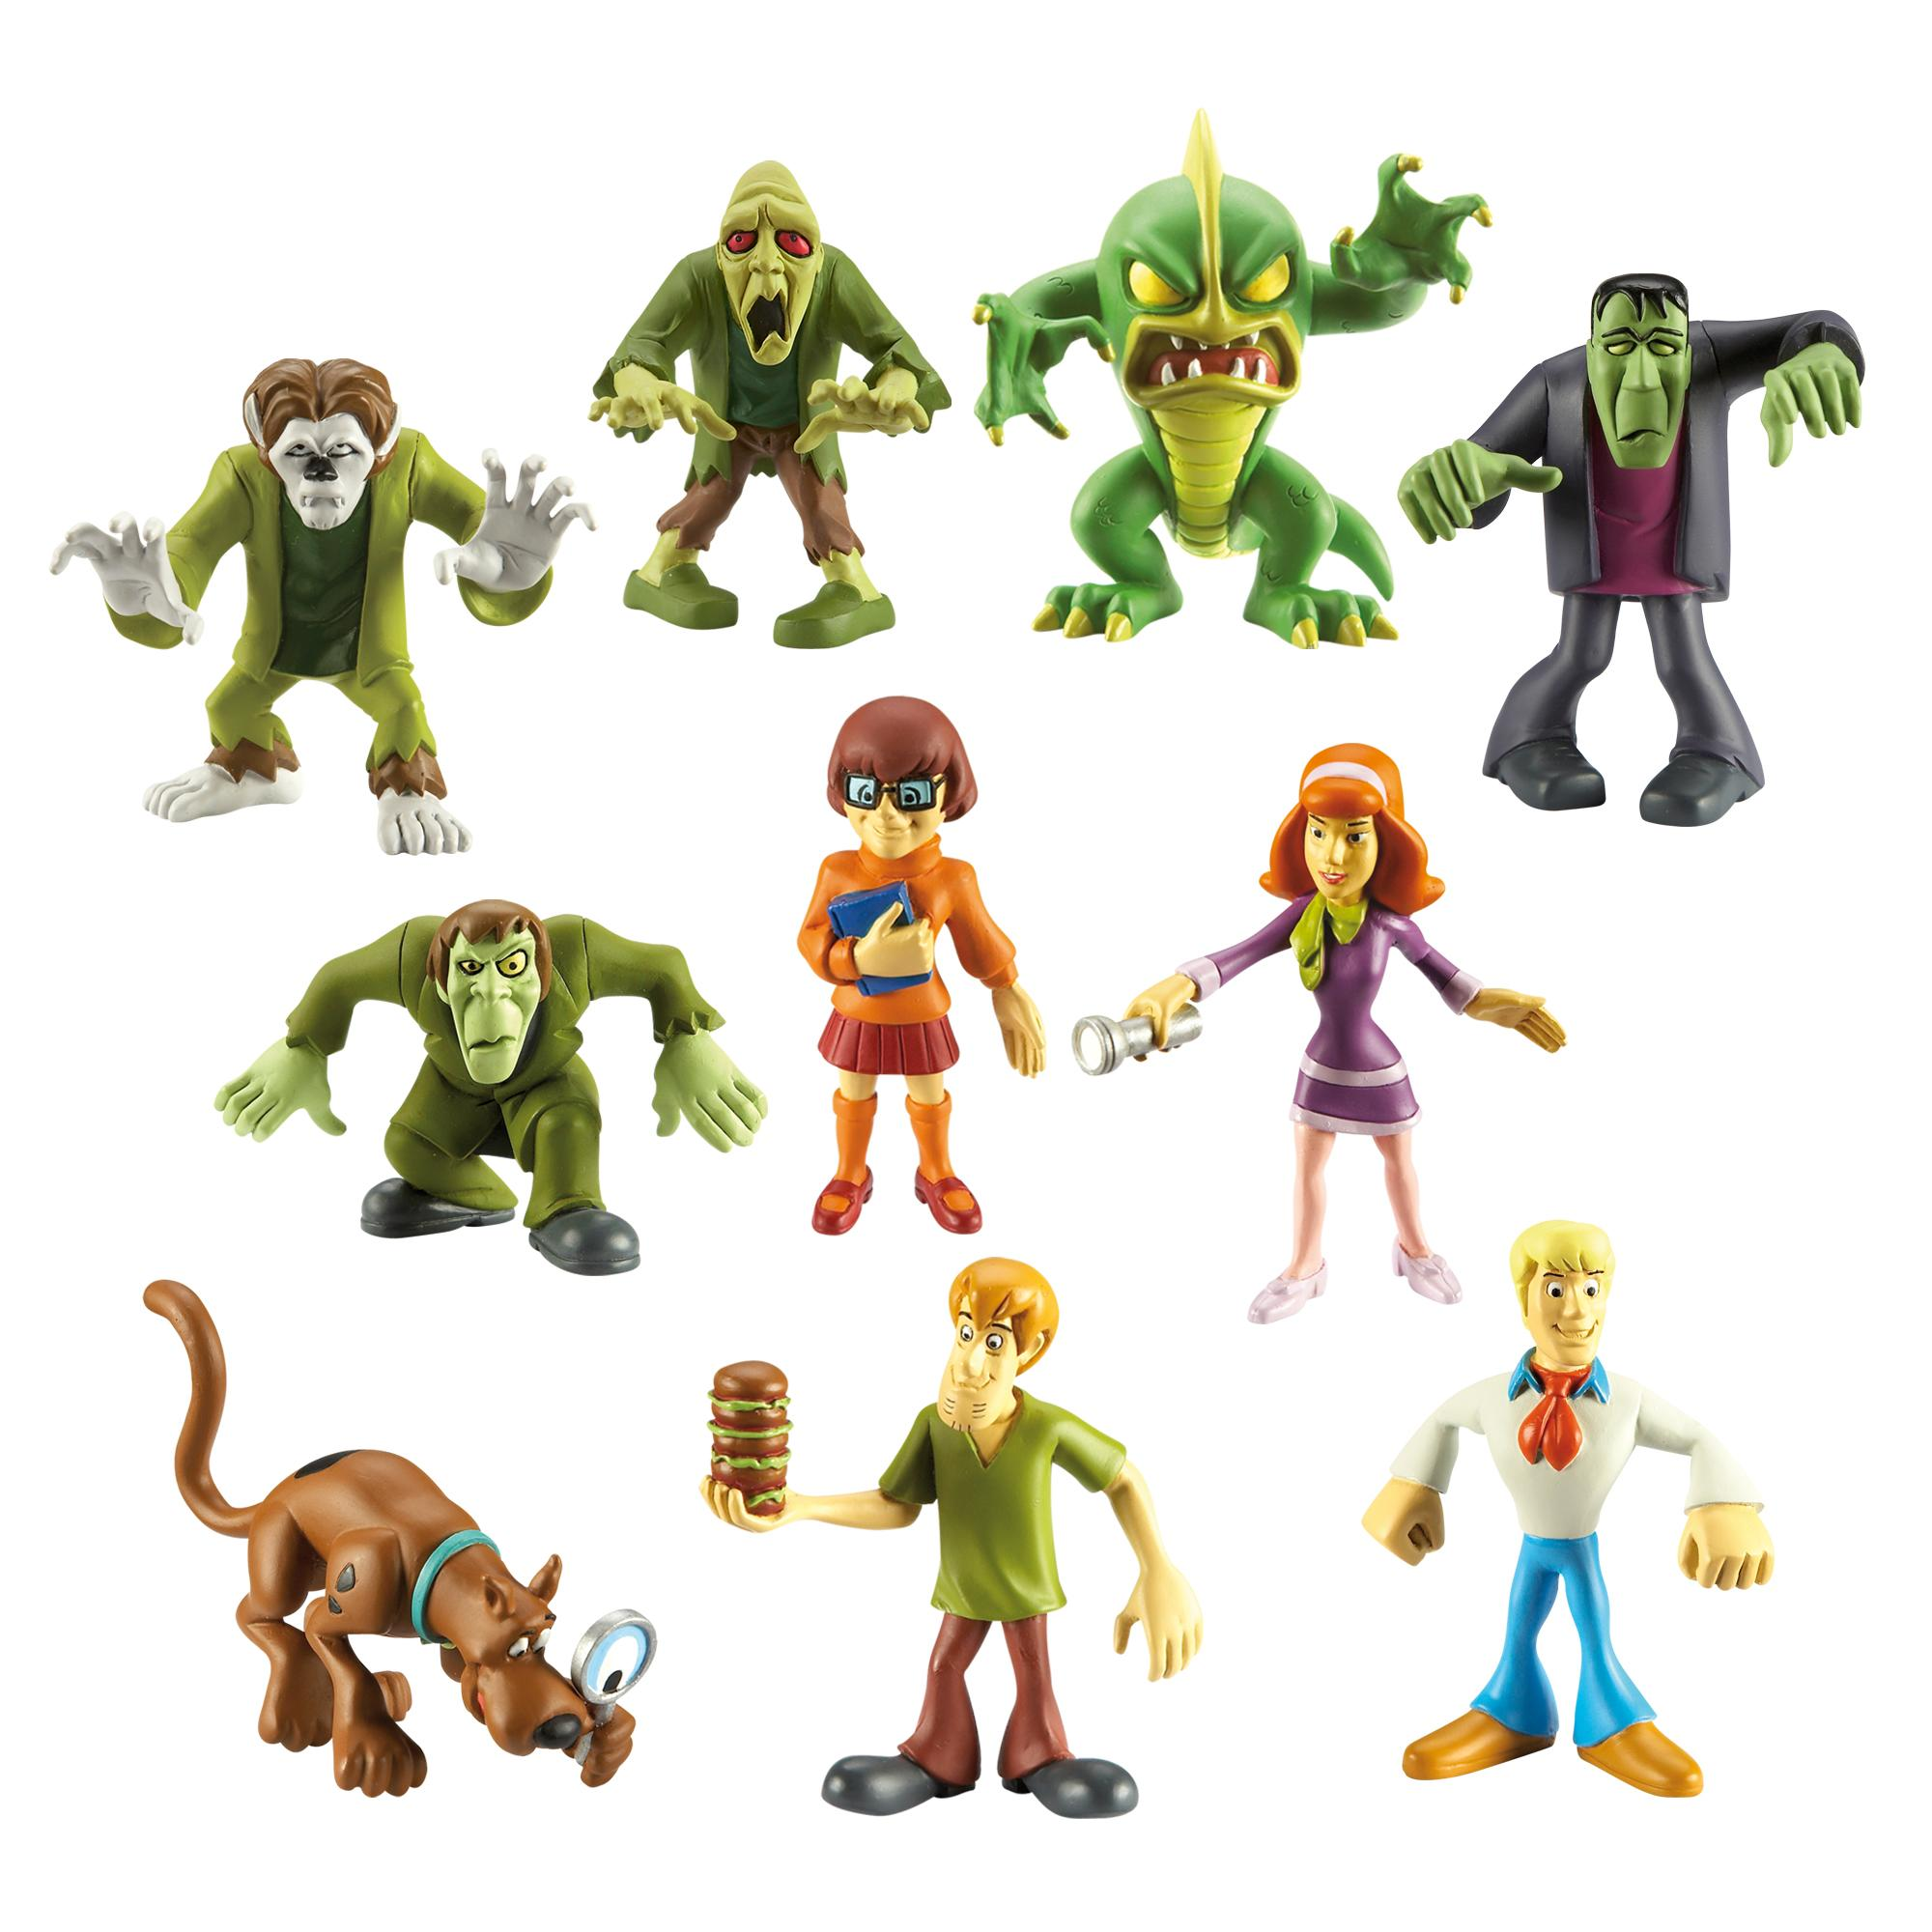 Scooby Doo Toys : Amazon scooby doo mystery mates piece pack toys